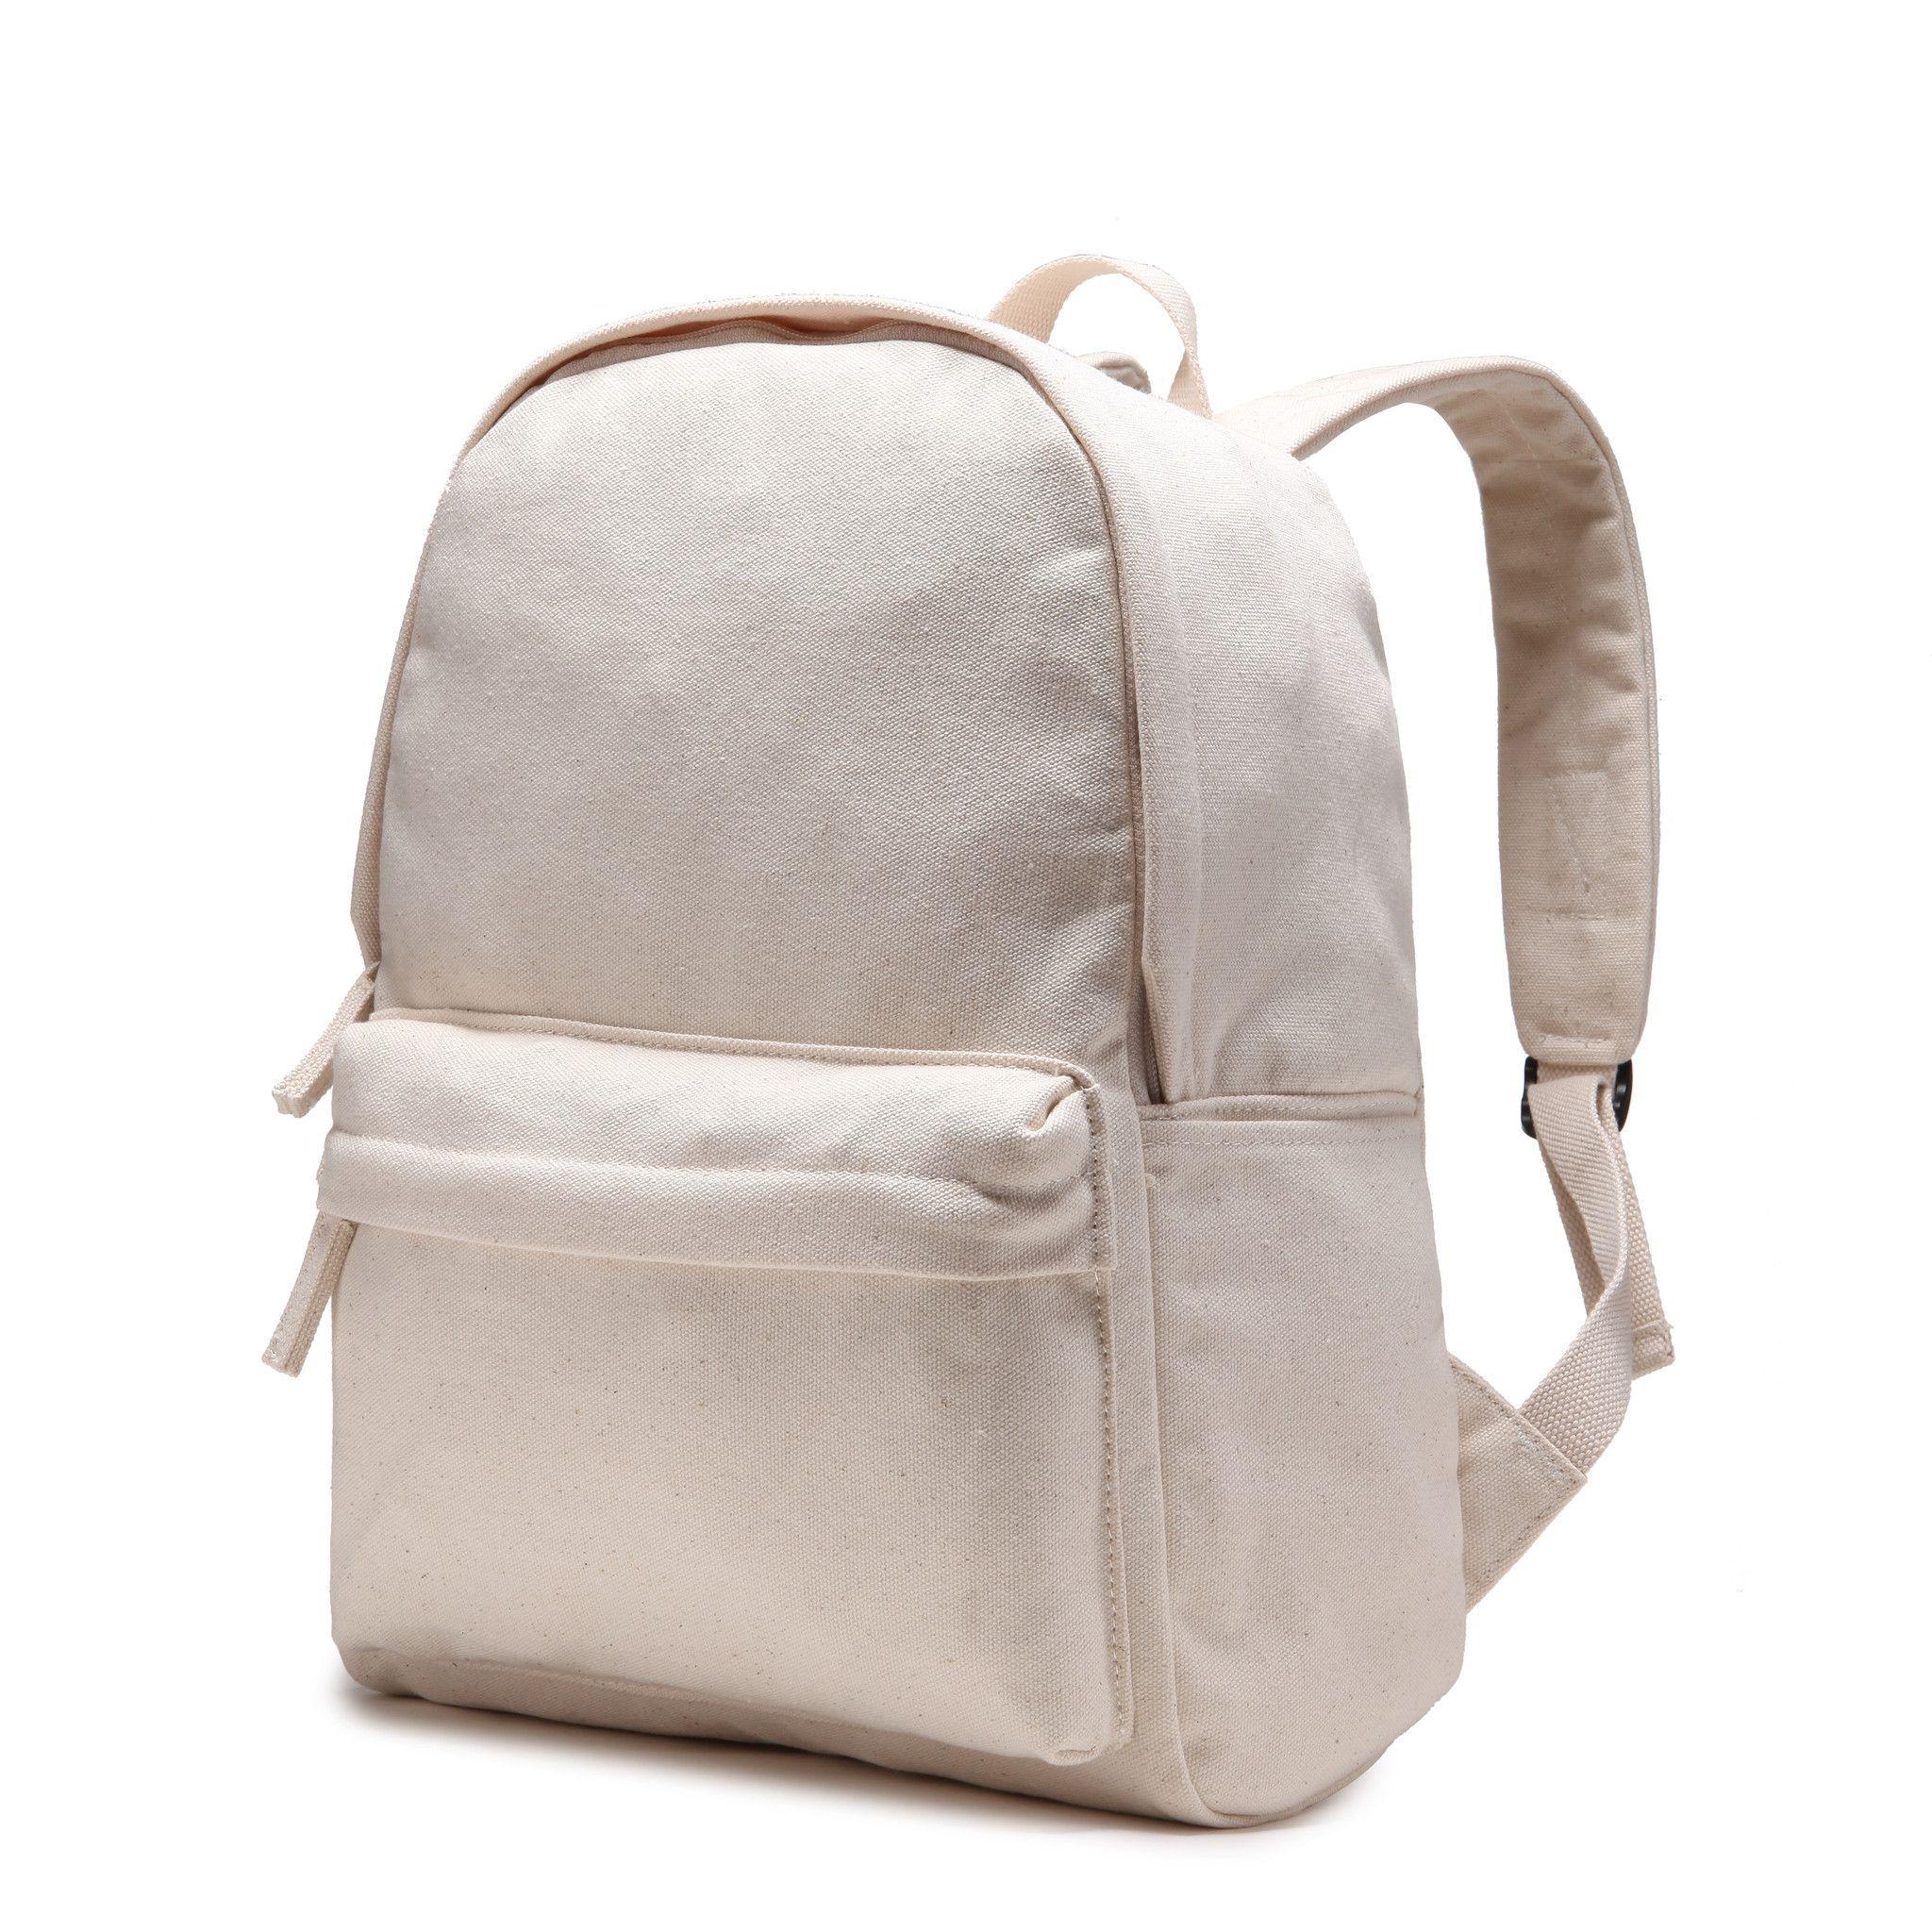 8035246a5840 Karitco Plain Canvas Rucksack Light-weight Shoulder Backpack ...